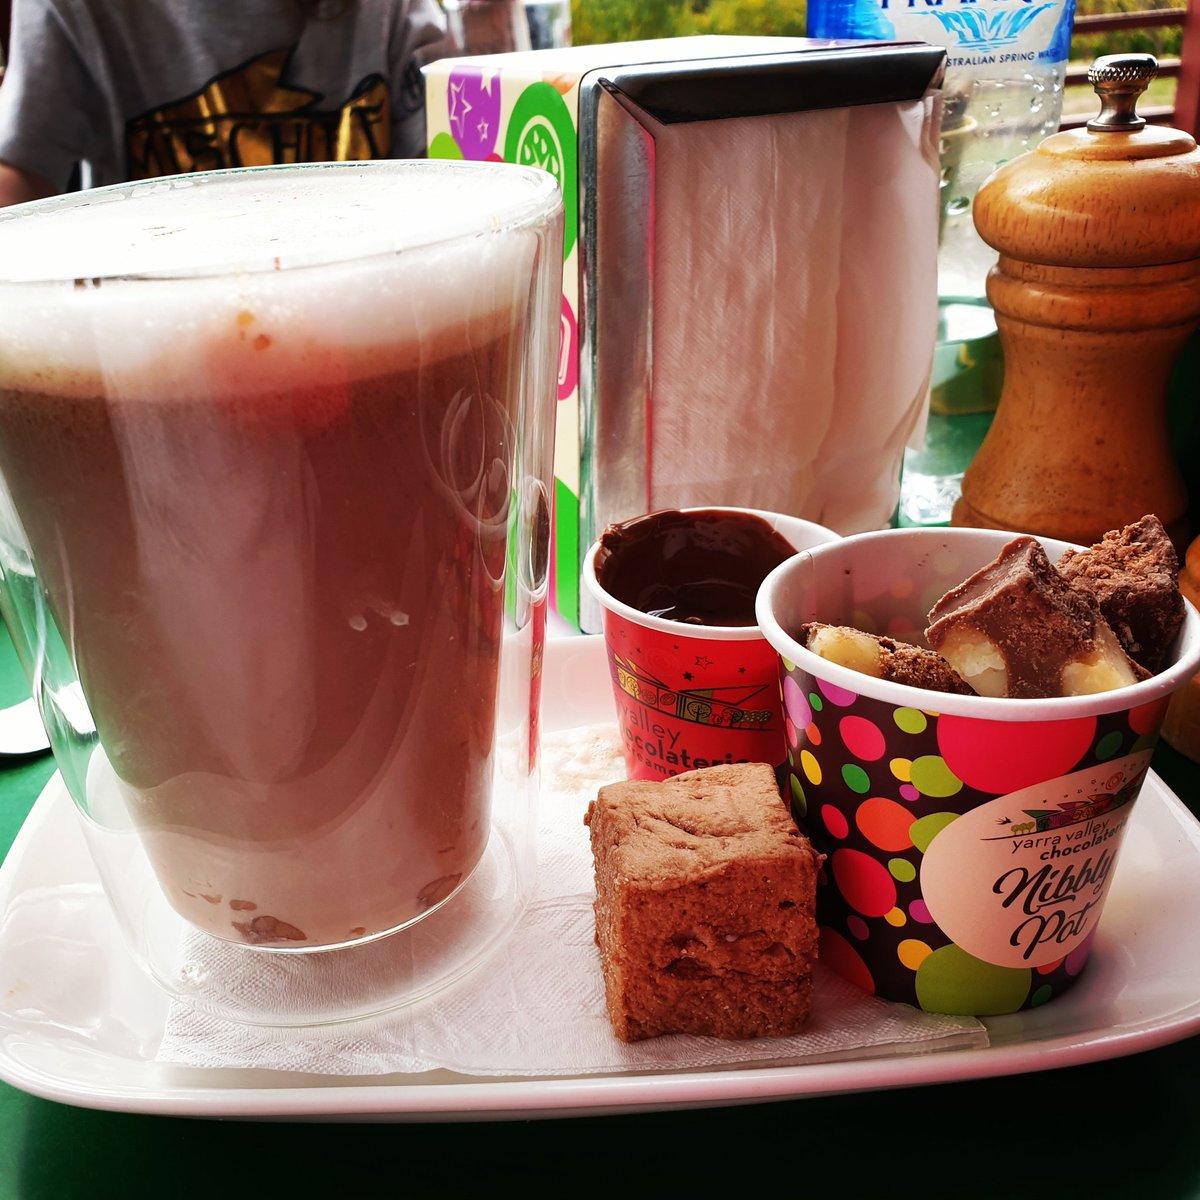 @yarravalleychocolaterie #yarravalley #yarravalleychocolaterie #hotchocolate #chocolate #cold #hotdrink #coldday #yummy #visityarravalley #victoriadiscovers #victoriadiscoversau #ilovemelbourne #view #visitmelbourne #visitmelbs #weekendaway #visitvictoria #visitvictoriaaustralia